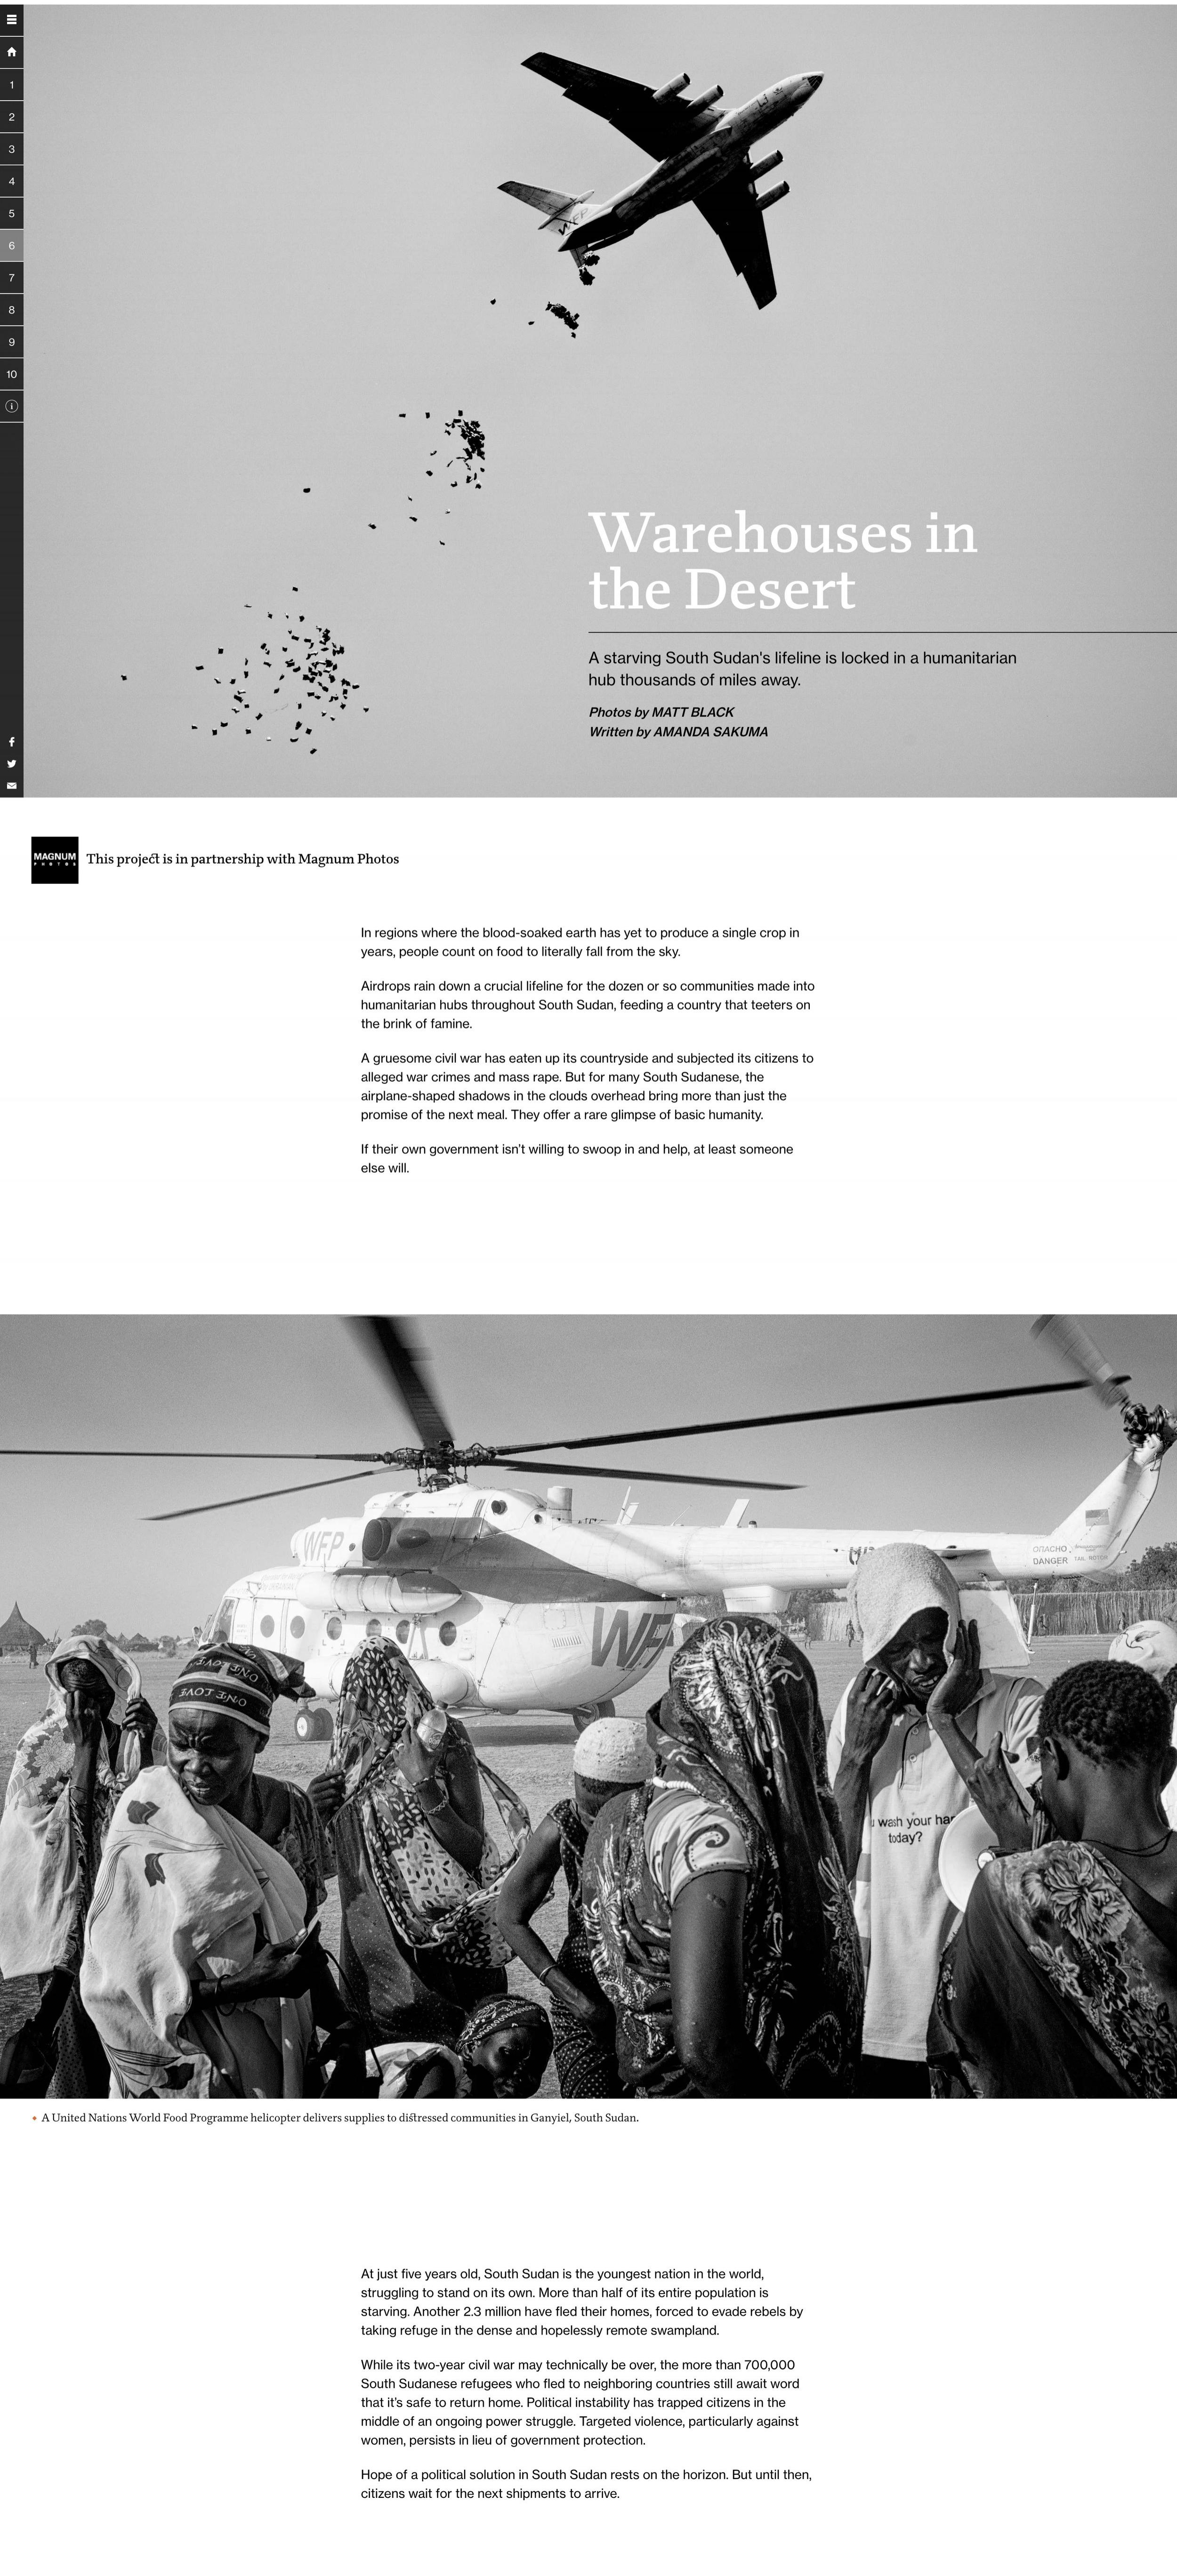 sudan_001.jpg